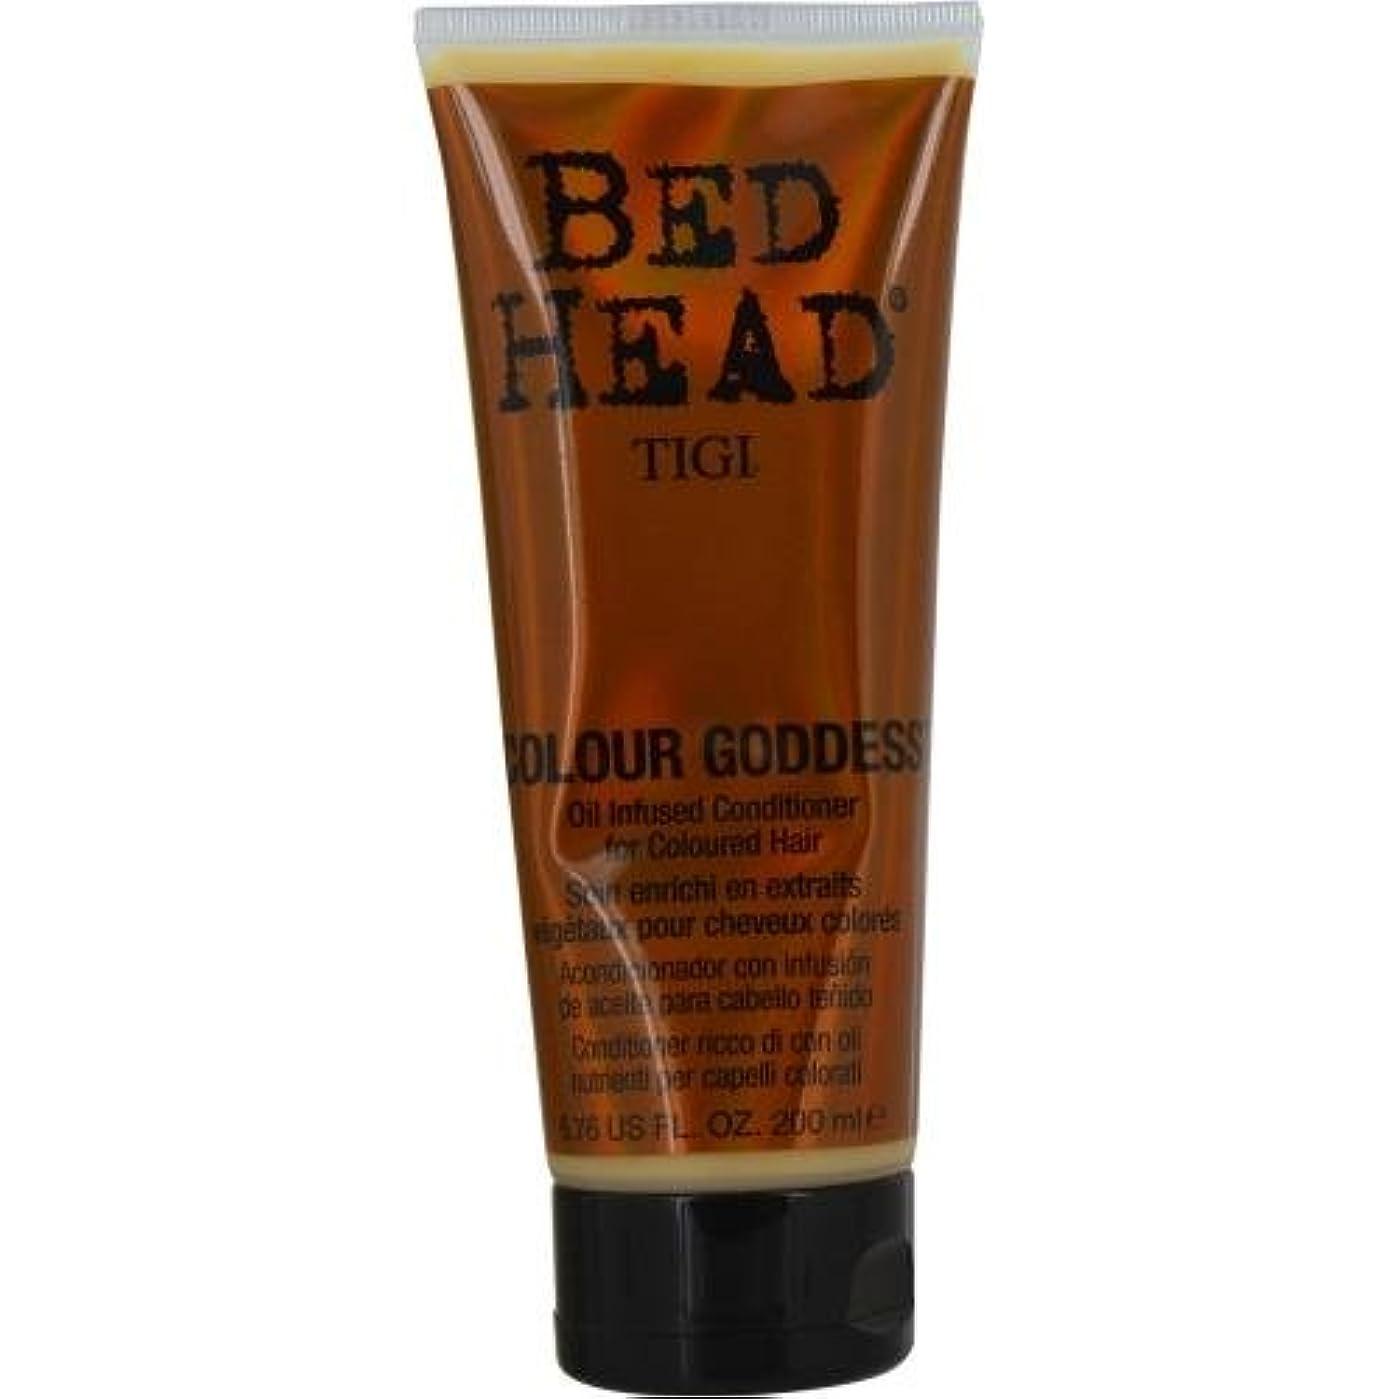 TIGI Bed Head Color Goddess Oil Infused Conditioner, 6.76 Ounce by TIGI [並行輸入品]